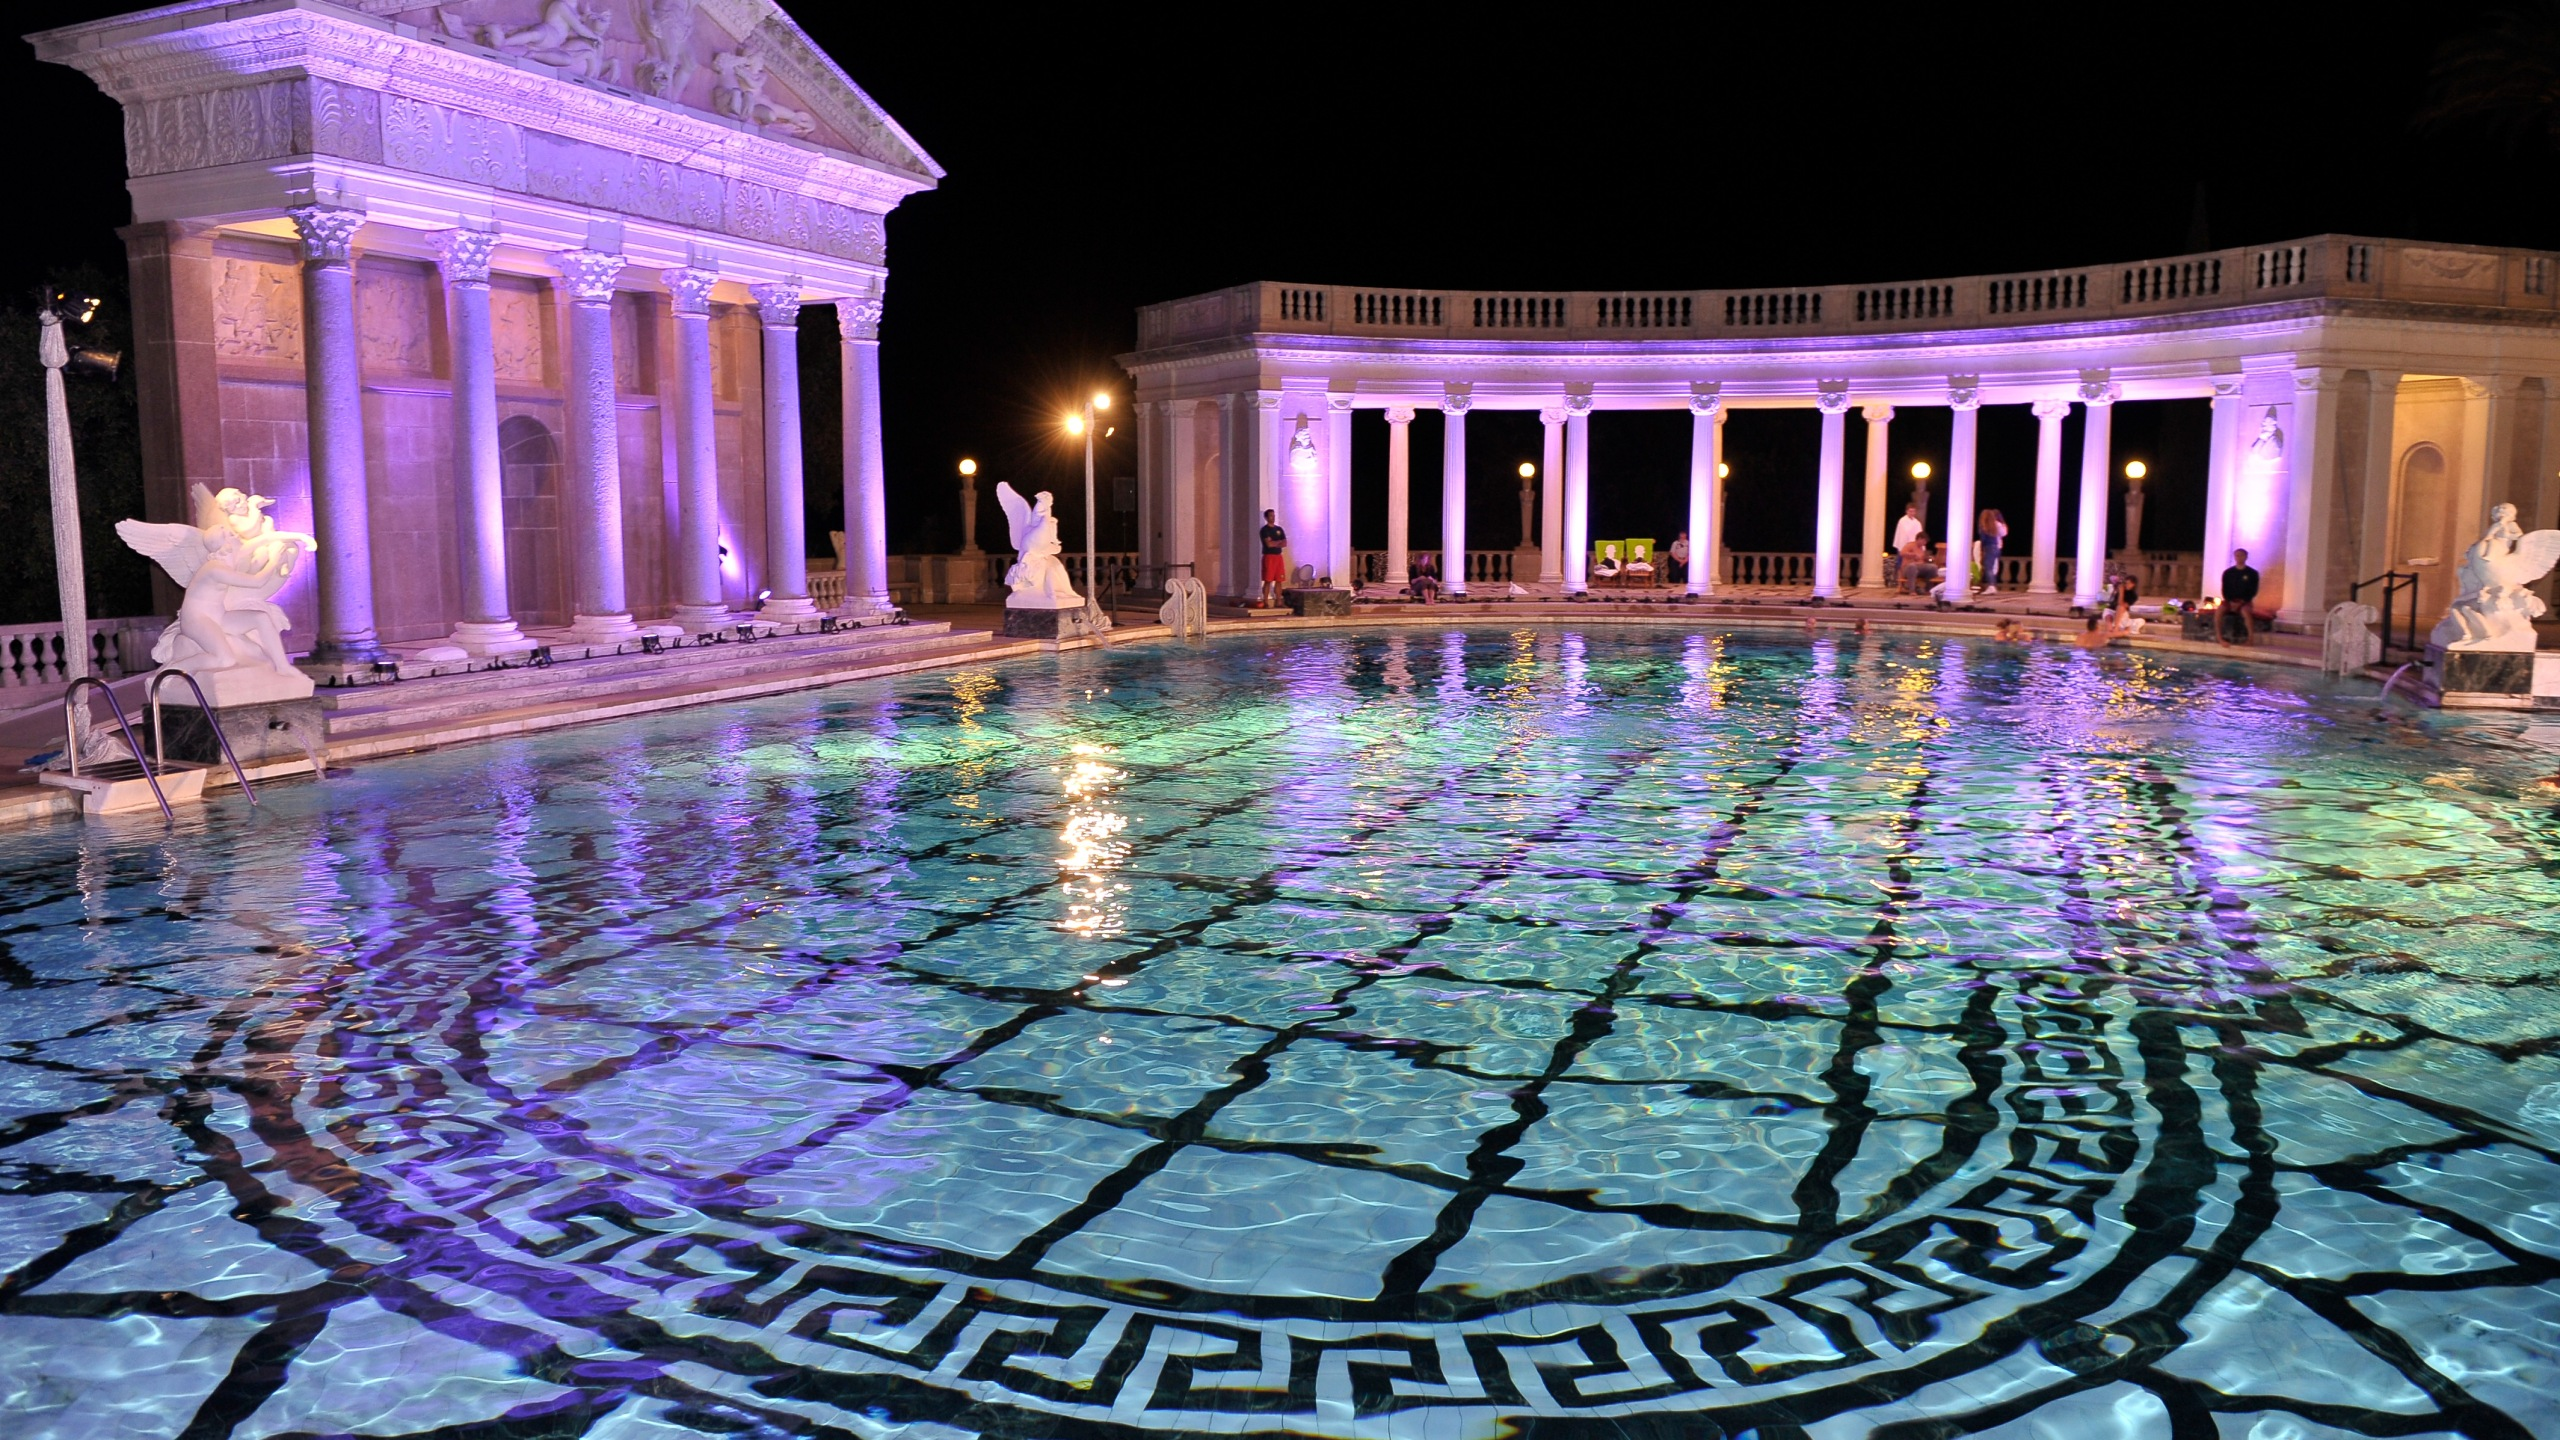 The Hearst Castle Neptune Pool is seen on Sep. 7, 2013, in San Simeon, California. (Credit: Steve Jennings/Getty Images)